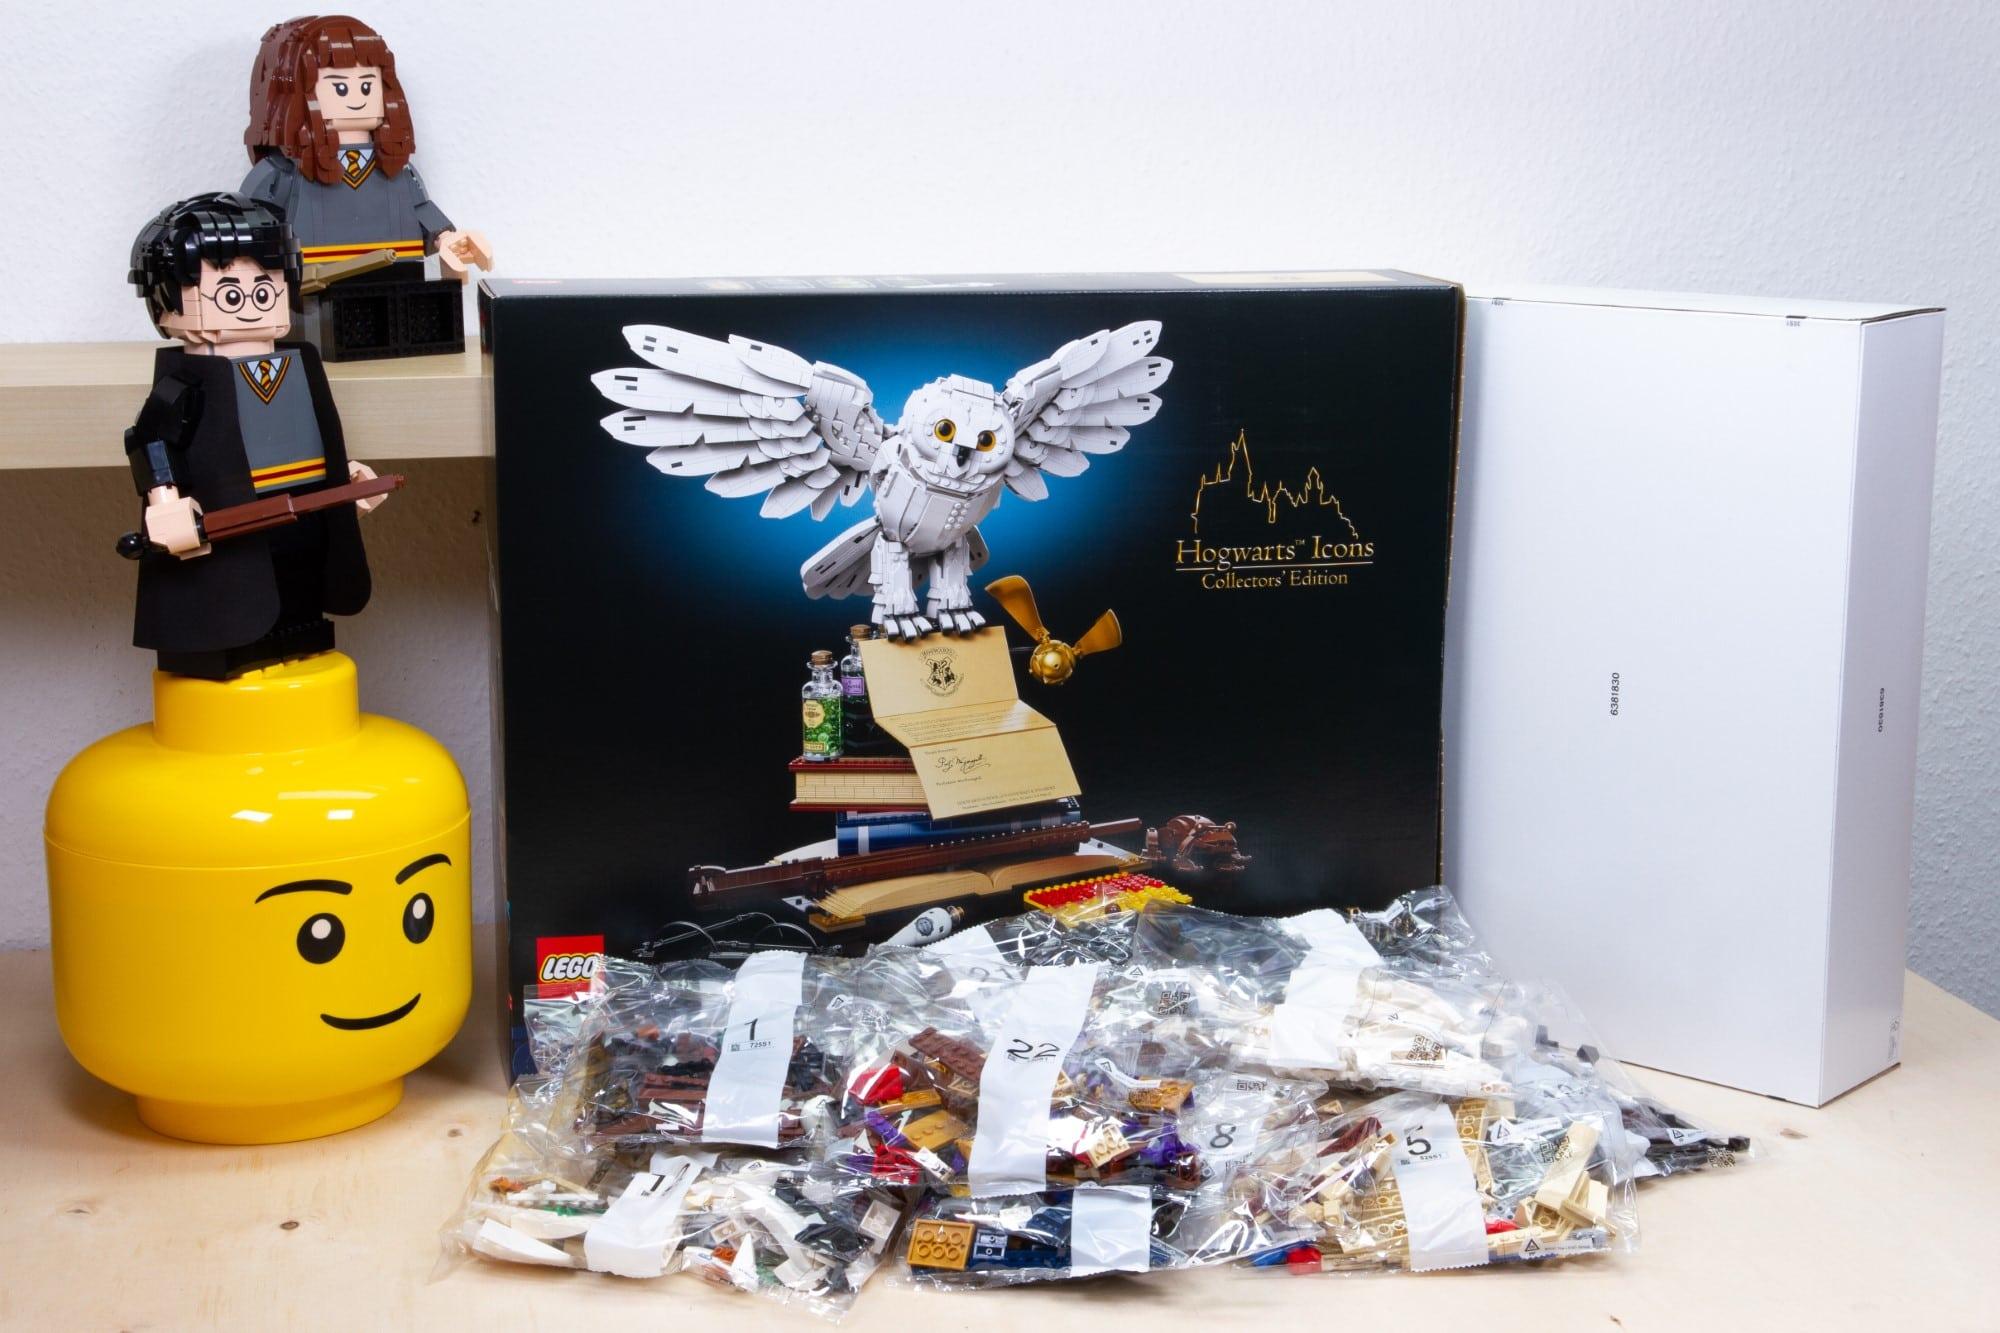 LEGO 76391 Hogwarts Icons Review Unboxing 1